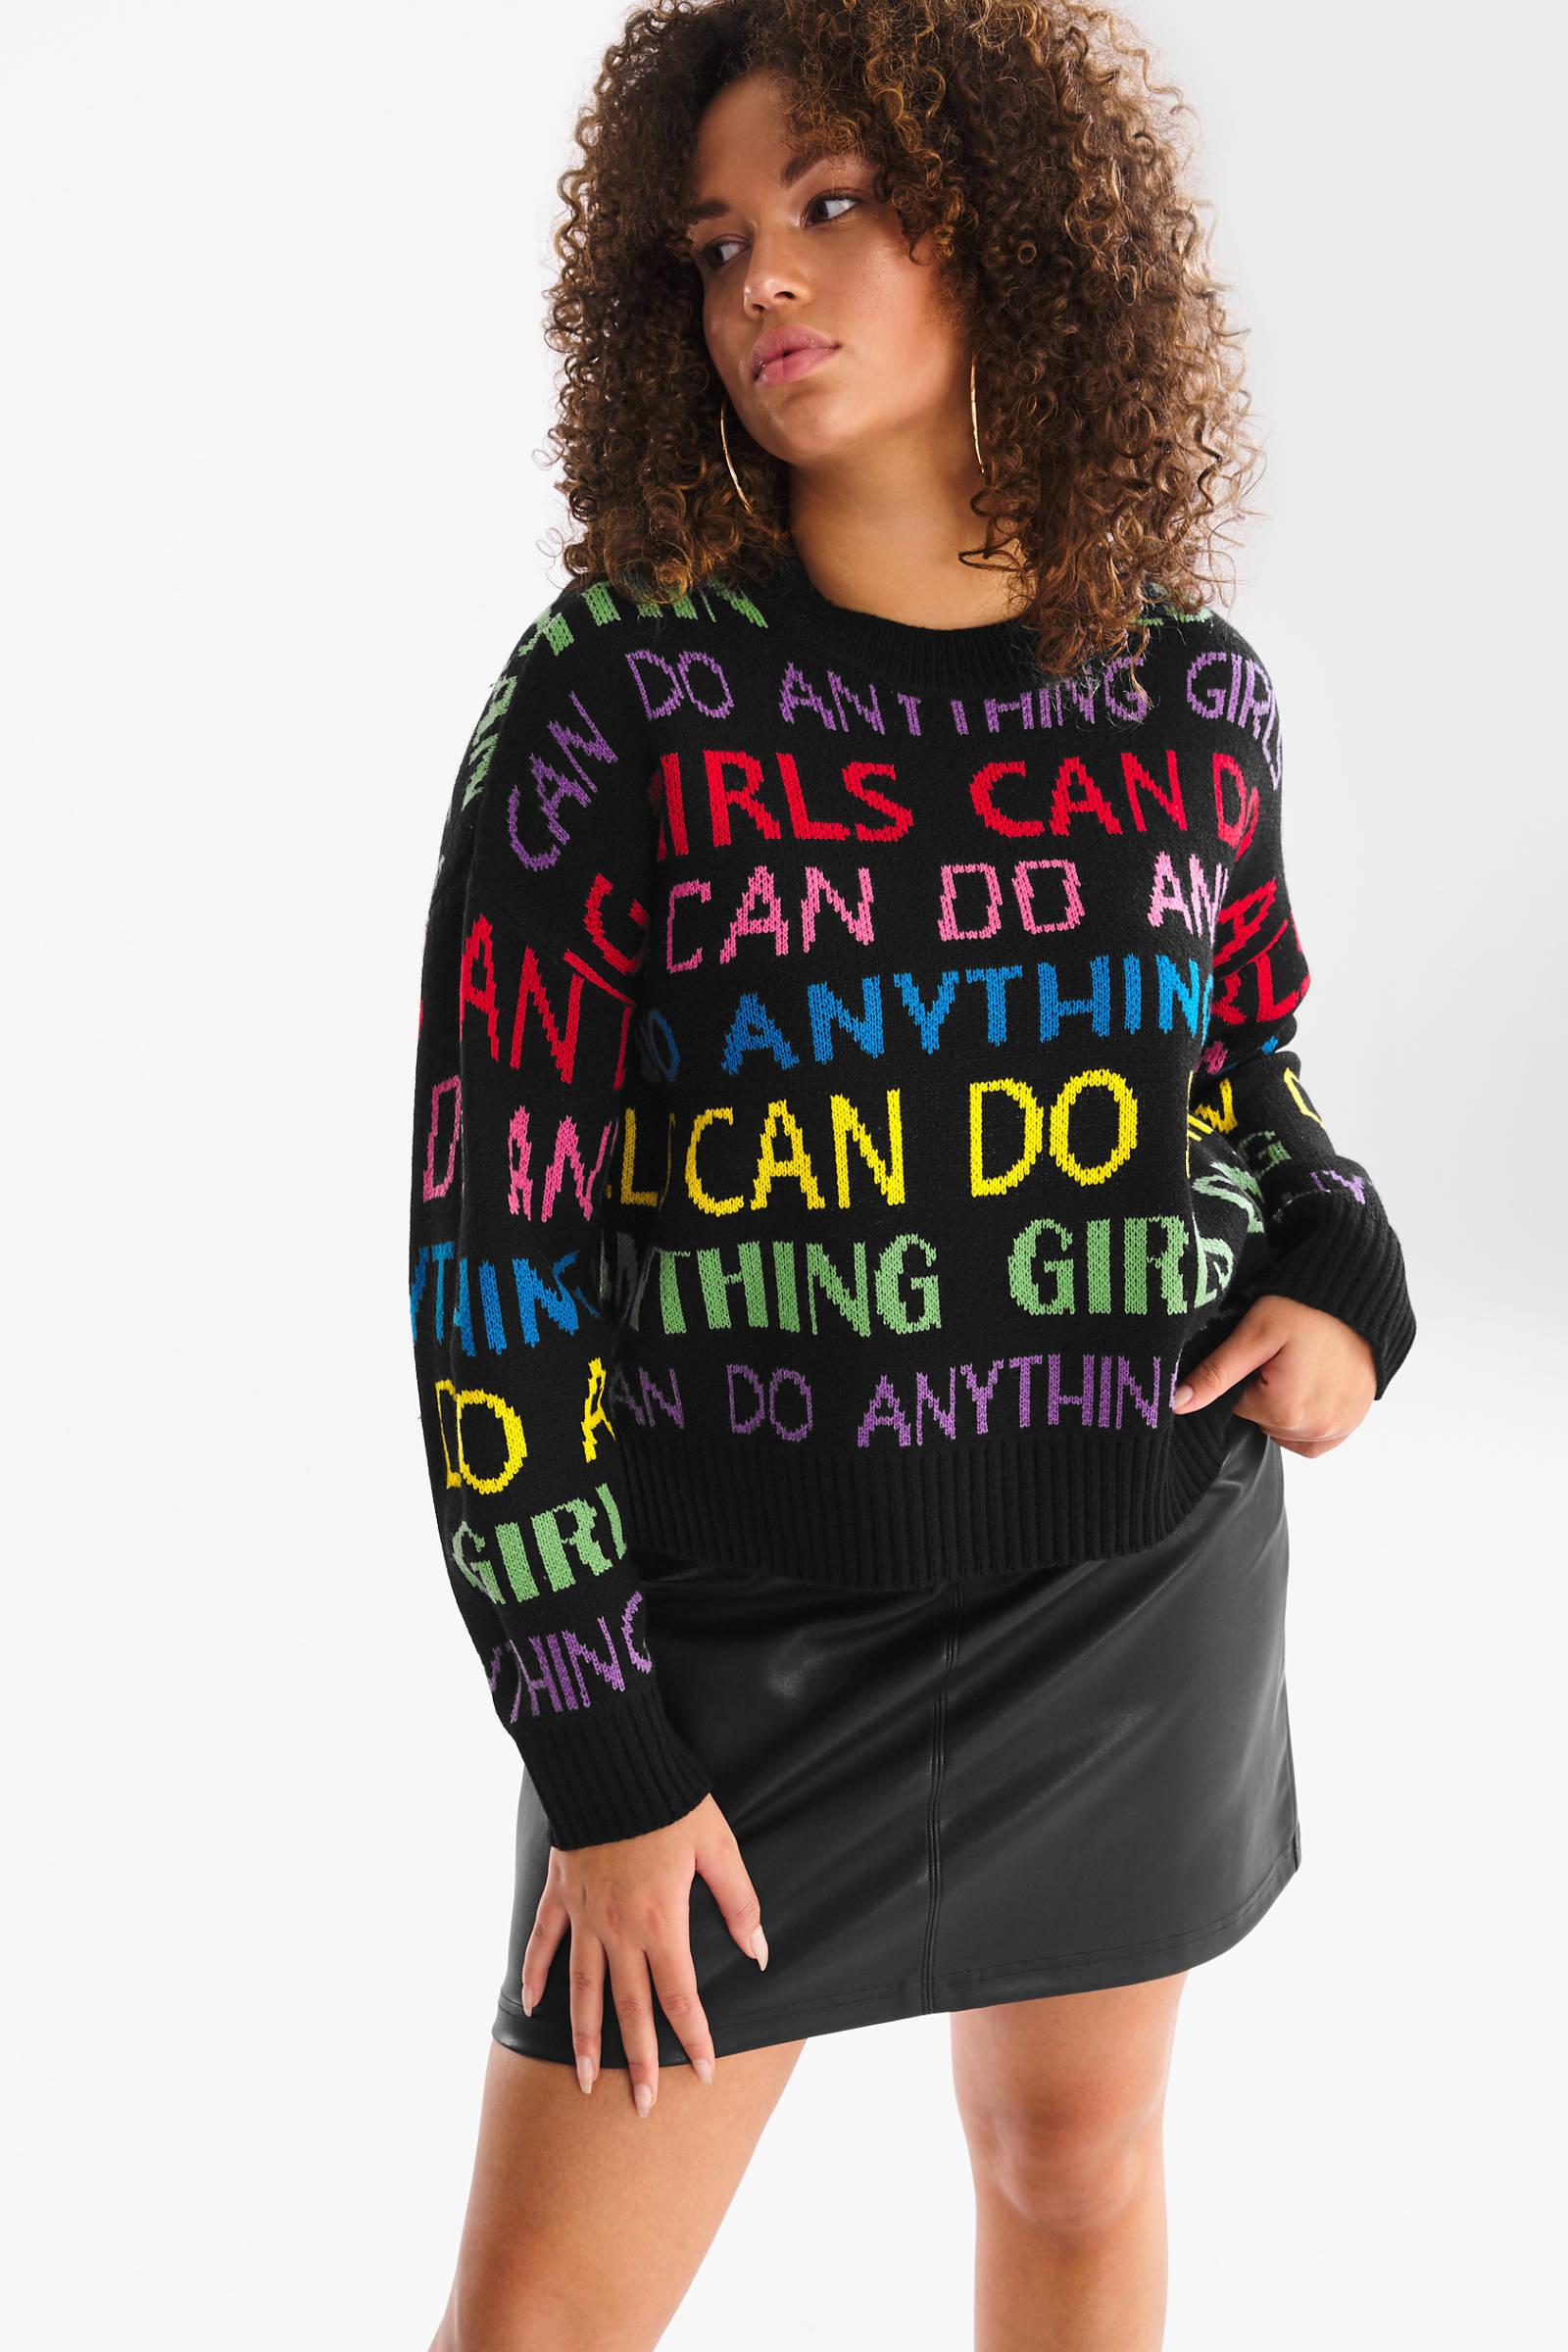 Clockhouse Girls truien & sweatshirts | C&A Online Shop